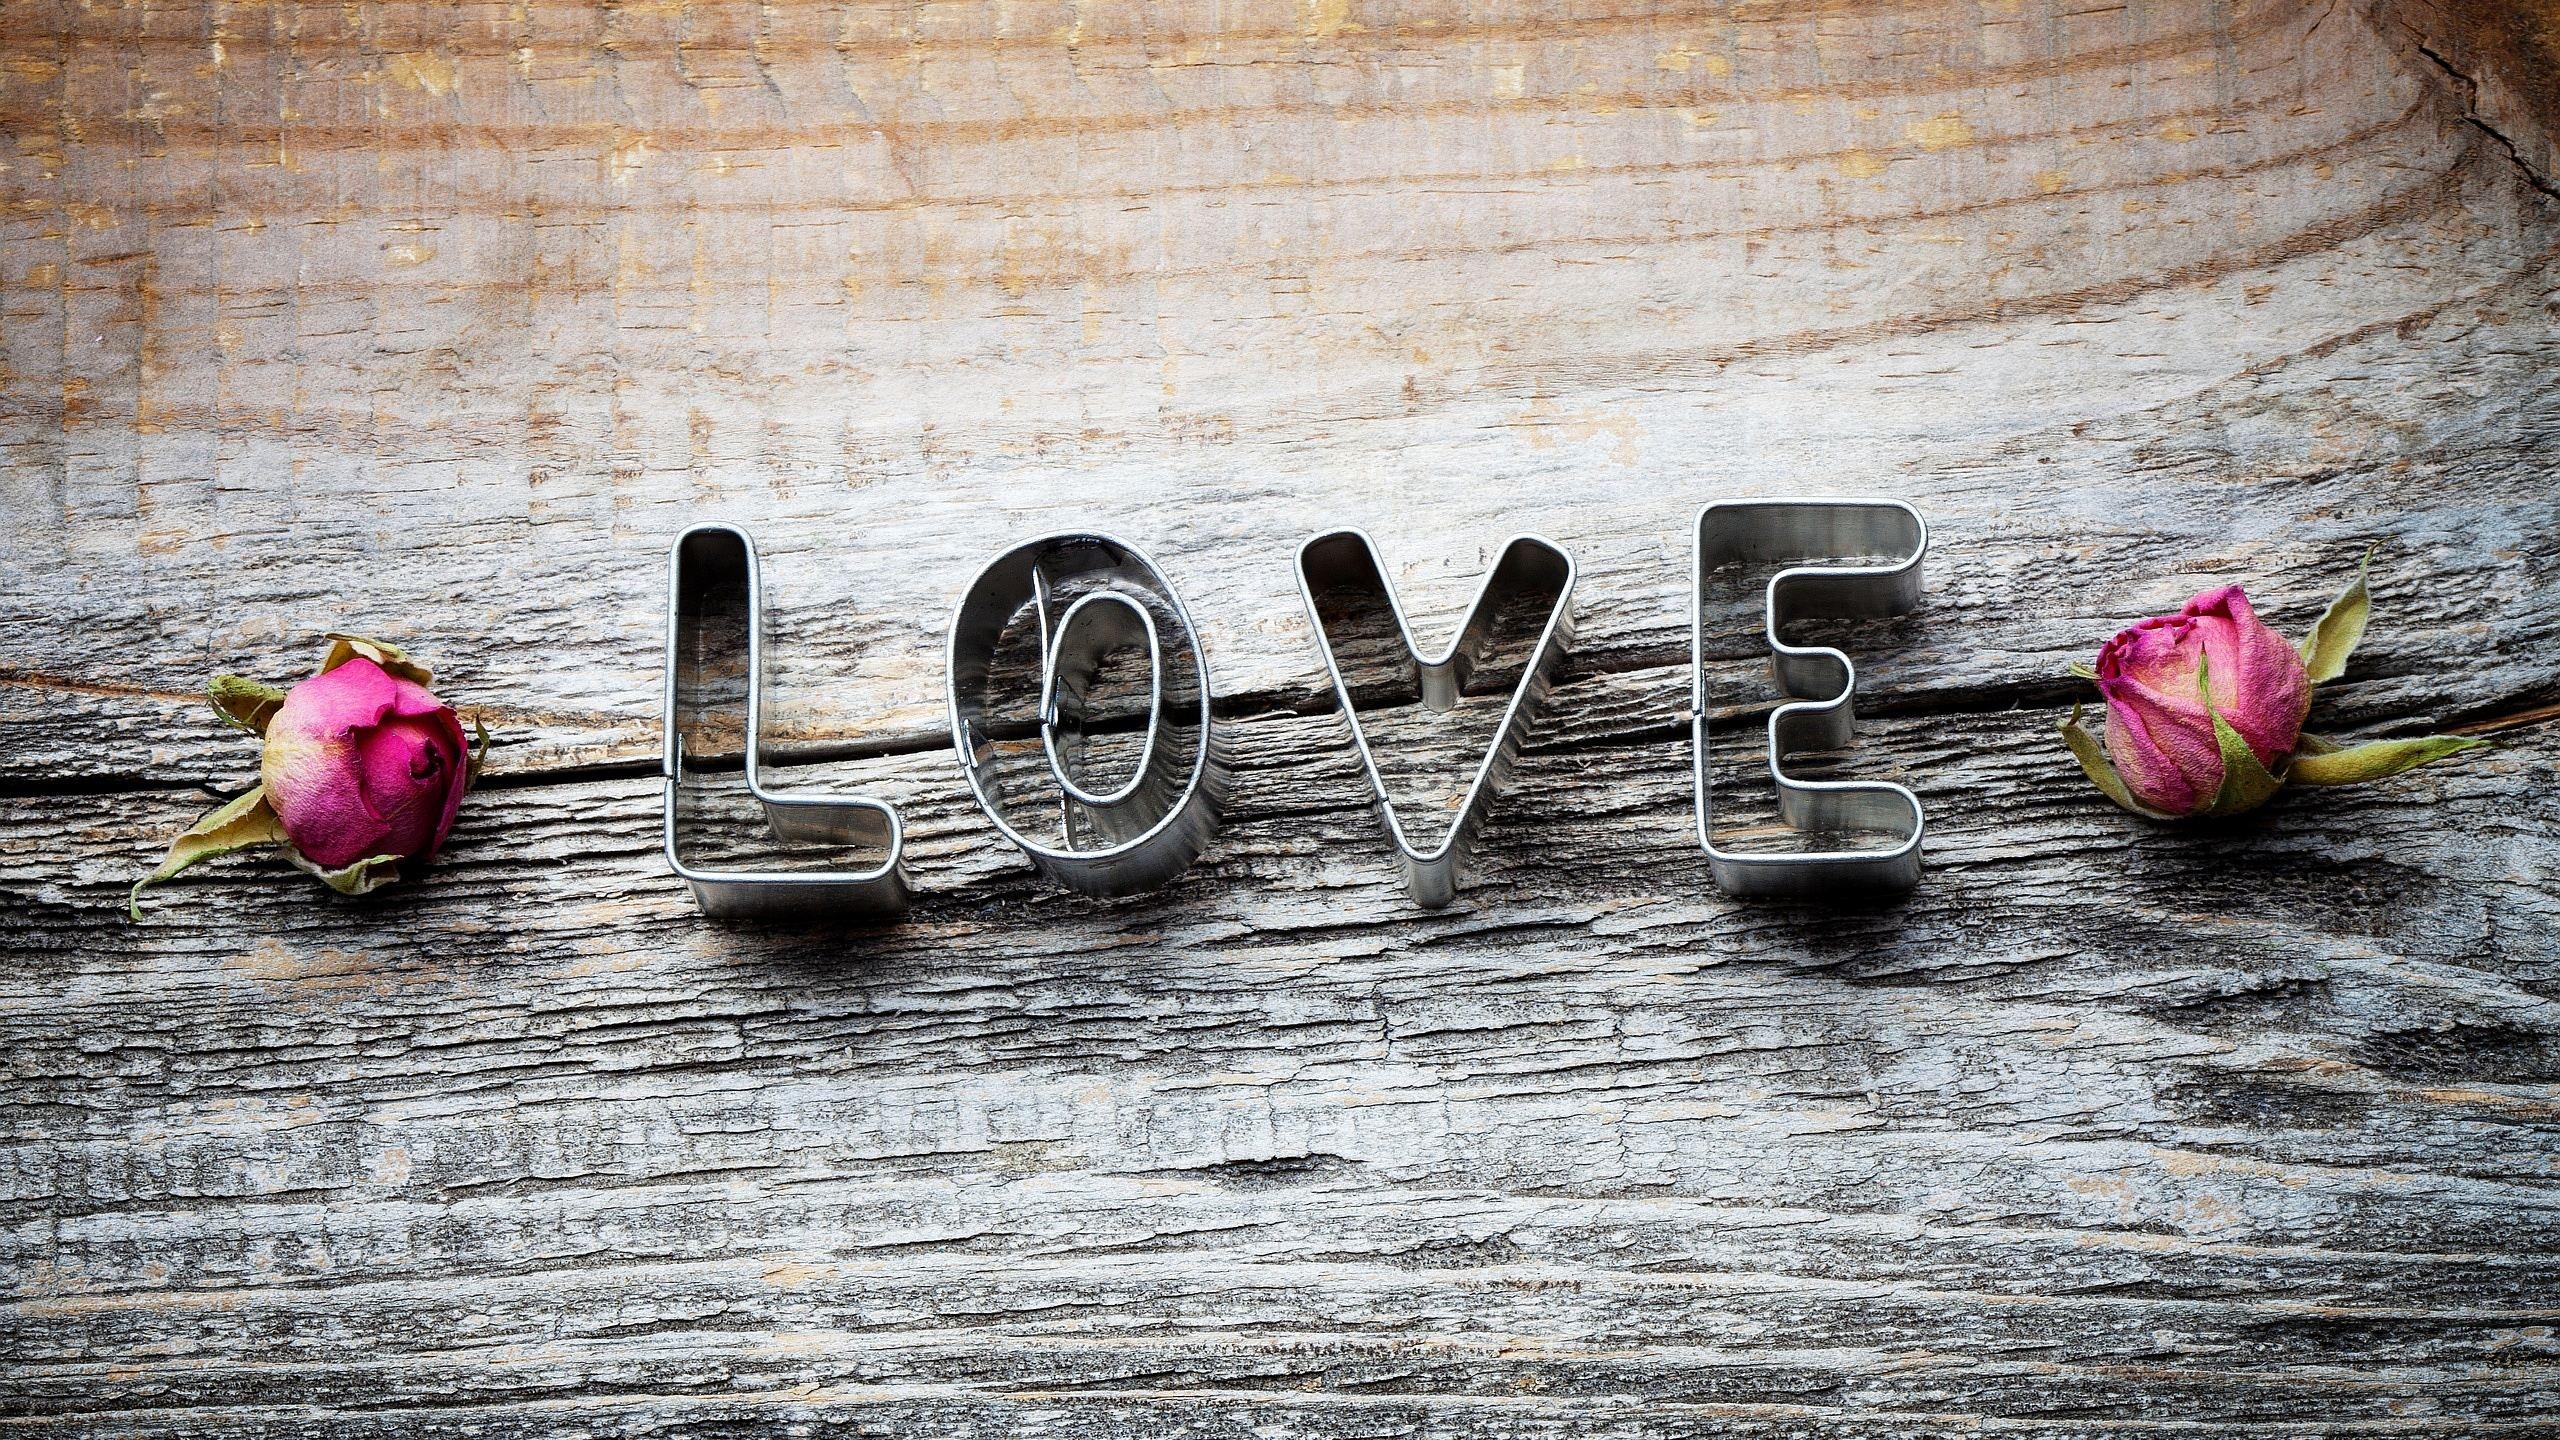 ��� ��, ���� ��� ���� 2016 Love , ���� ��� ���� ������ ���������� ������� 2015_1391459565_110.